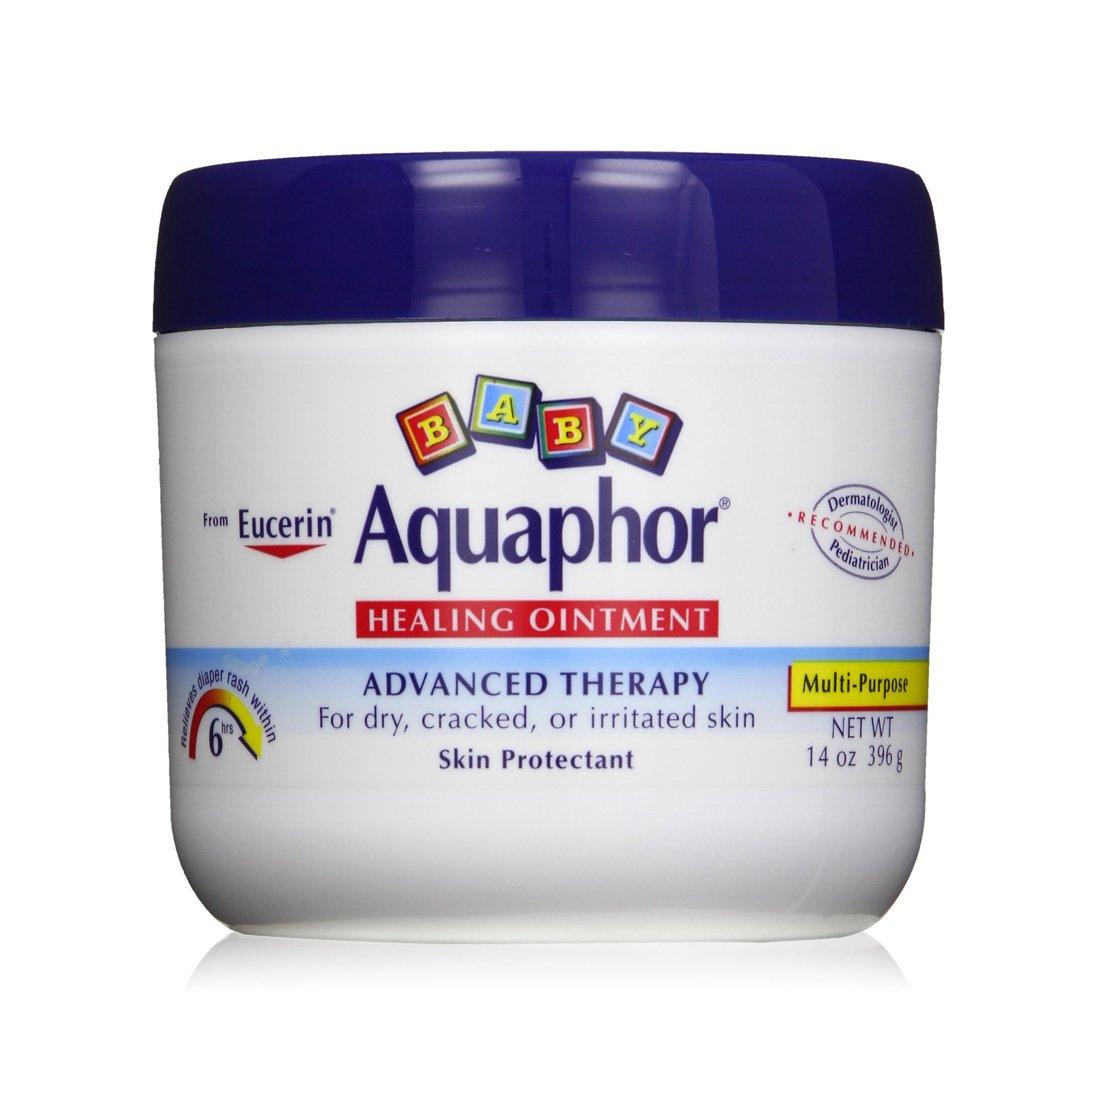 Aquaphor Baby Healing Ointment, Advanced Therapy, 14 Ounce Jar New Born Lotion Beiersdorf Inc.